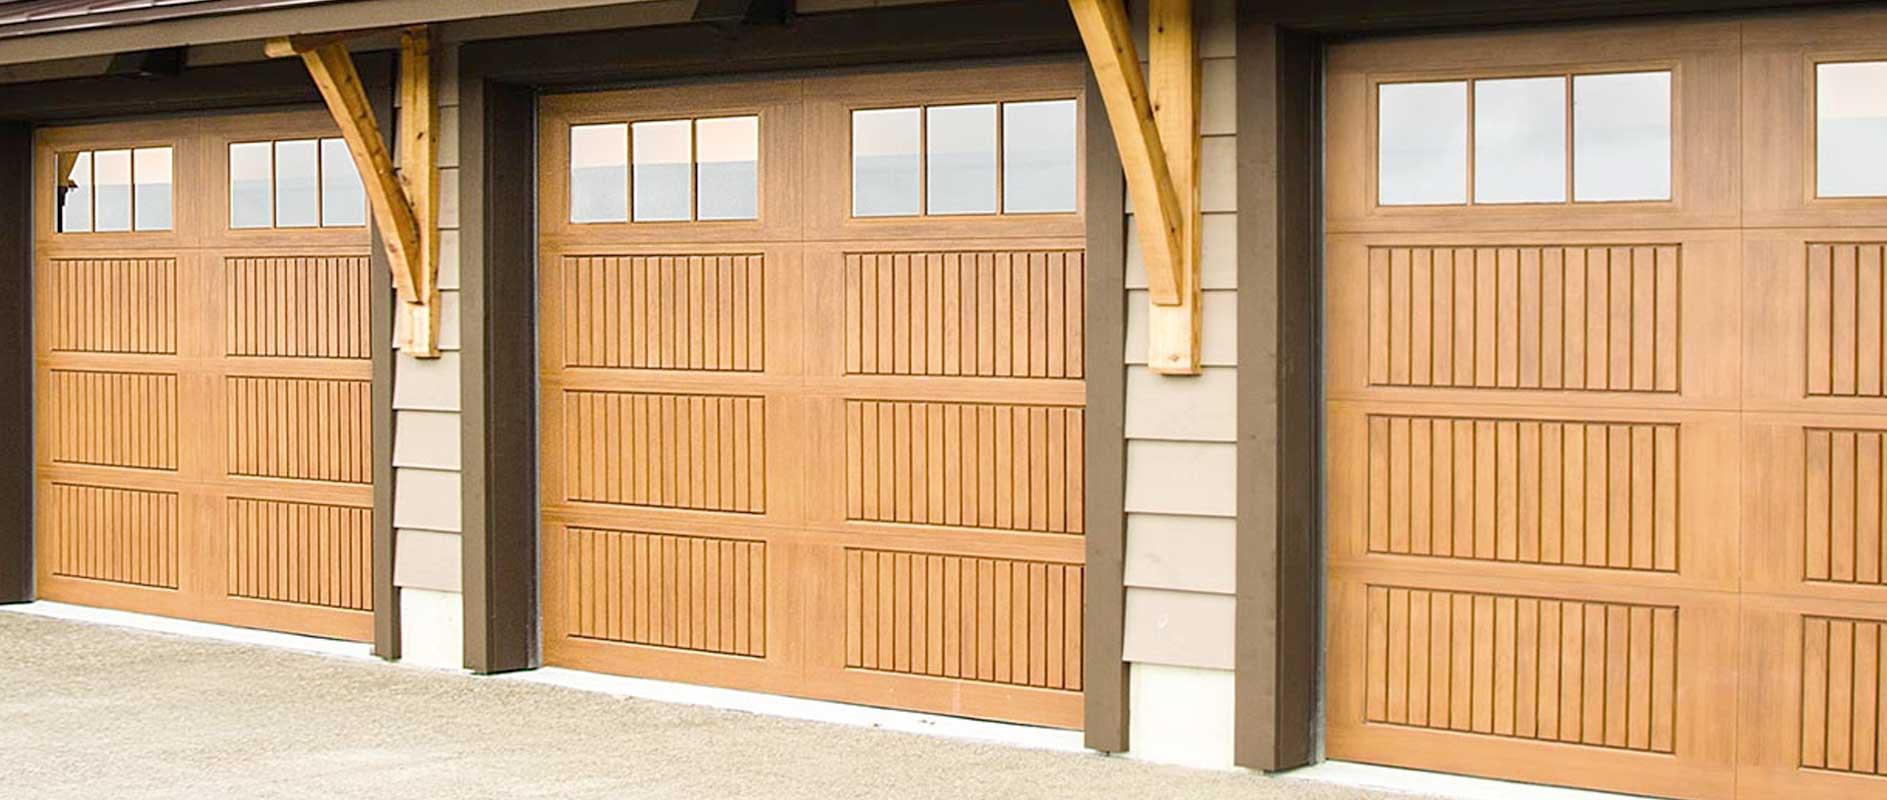 dd-doors-residential-garage-doors-hudson-valley